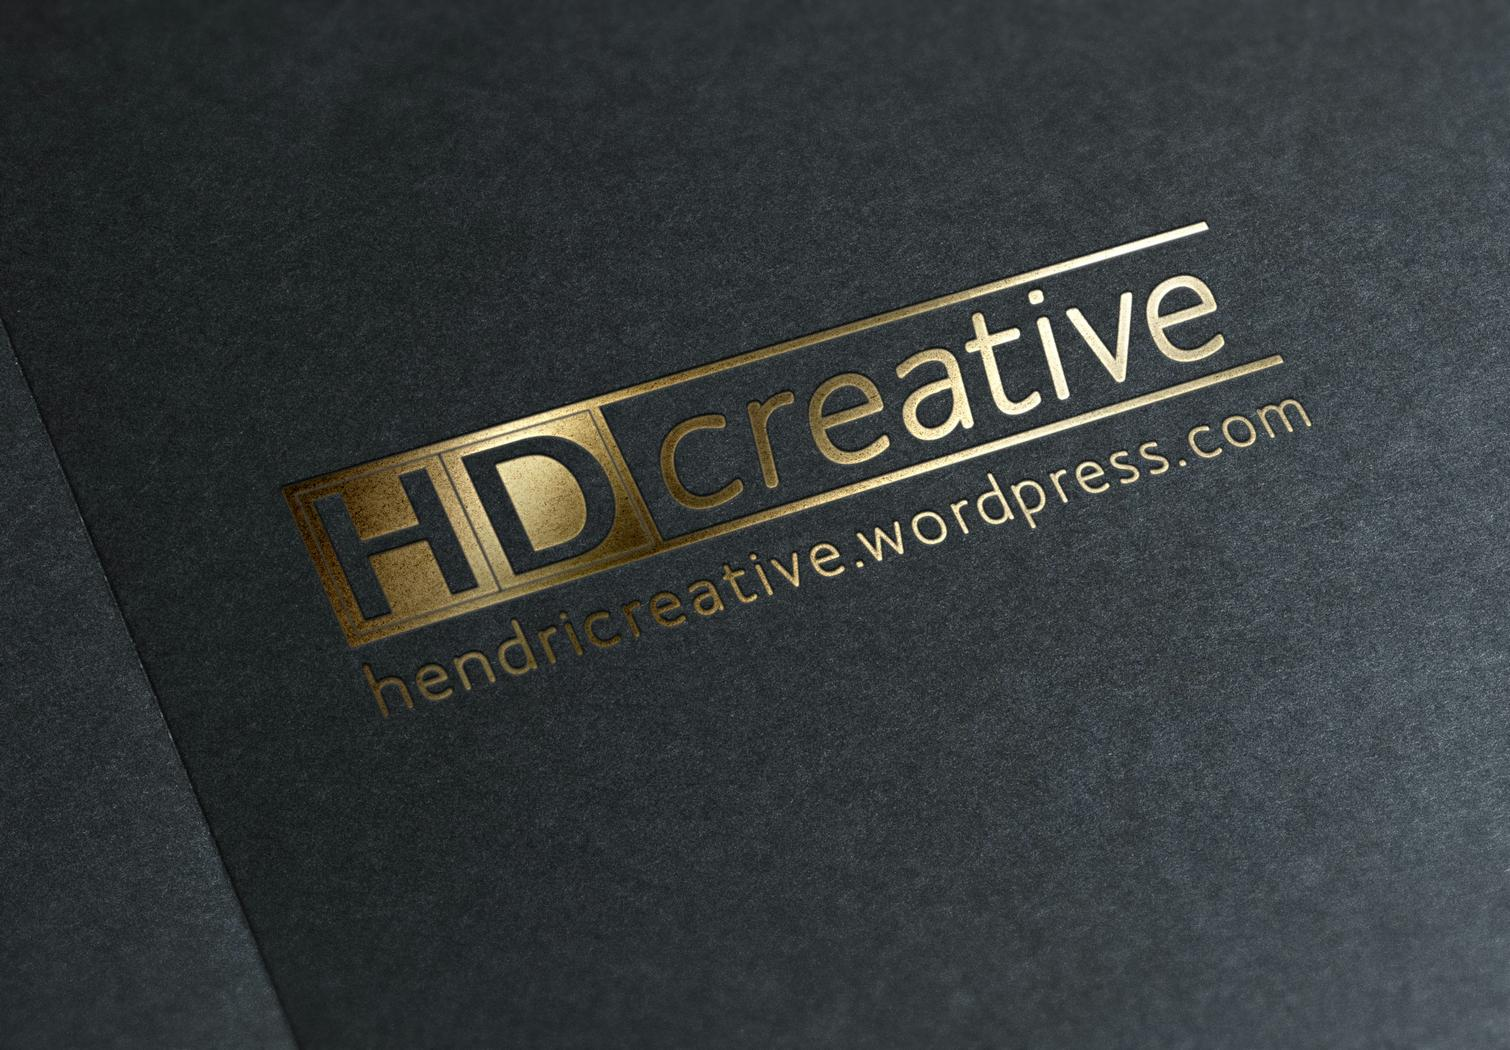 Hendri Creative